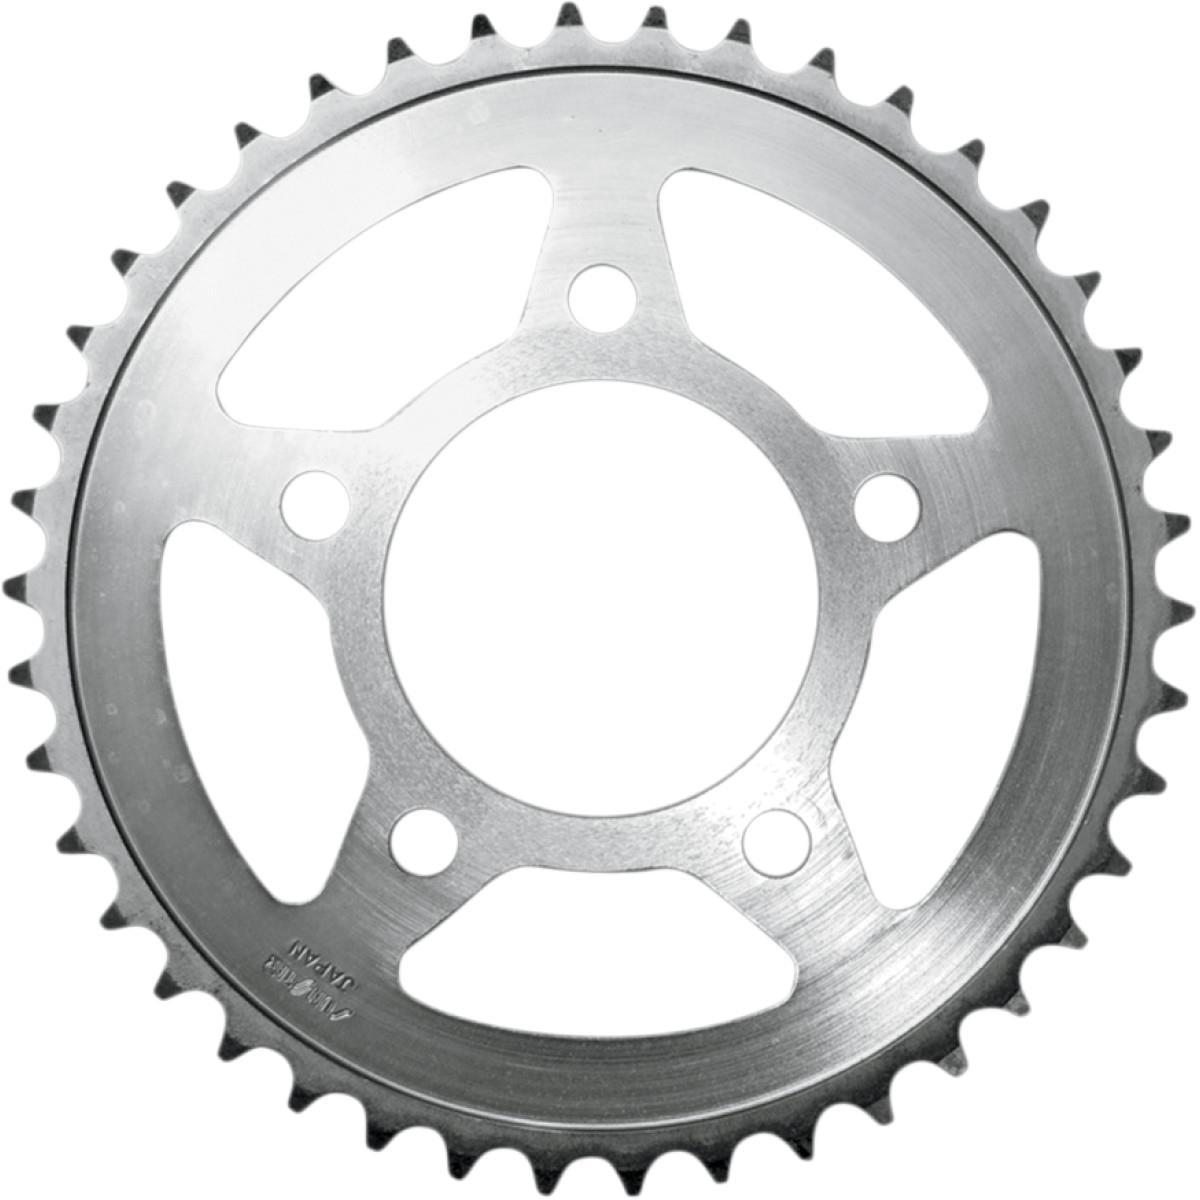 Sunstar 2-533842 Steel Rear Sprocket - 42T